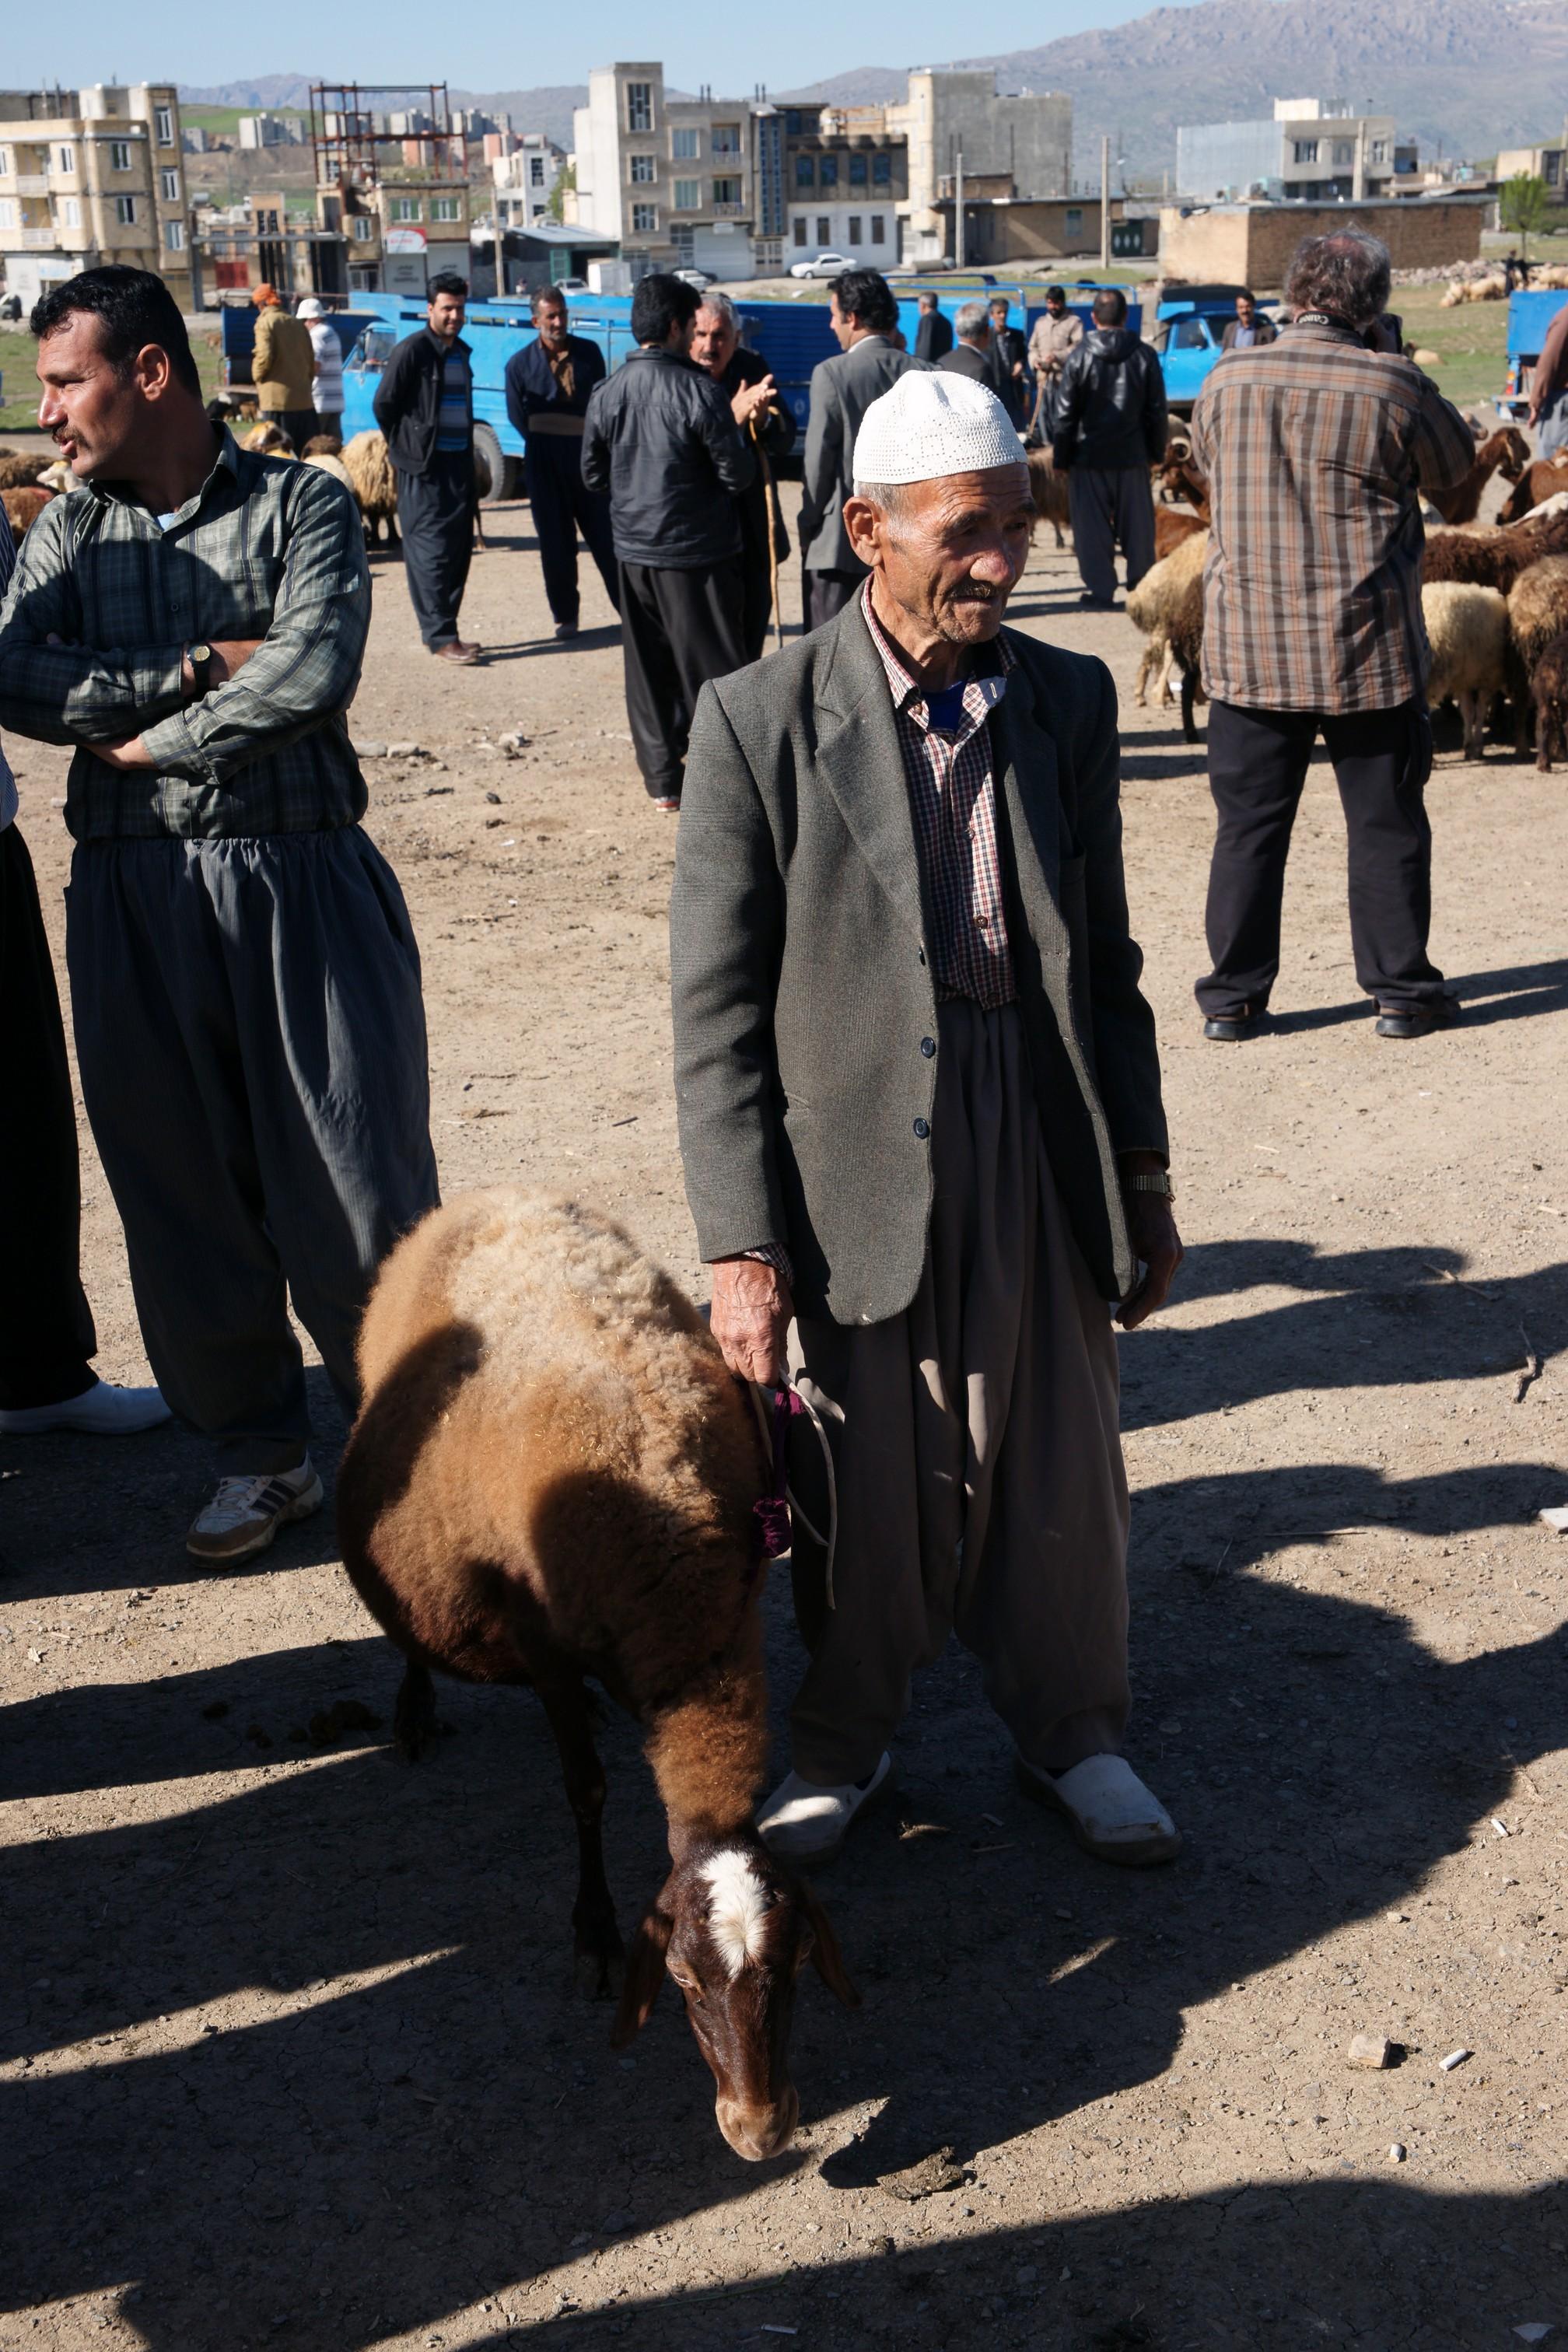 20160421_093214_A900.12578 Děda s ovcí